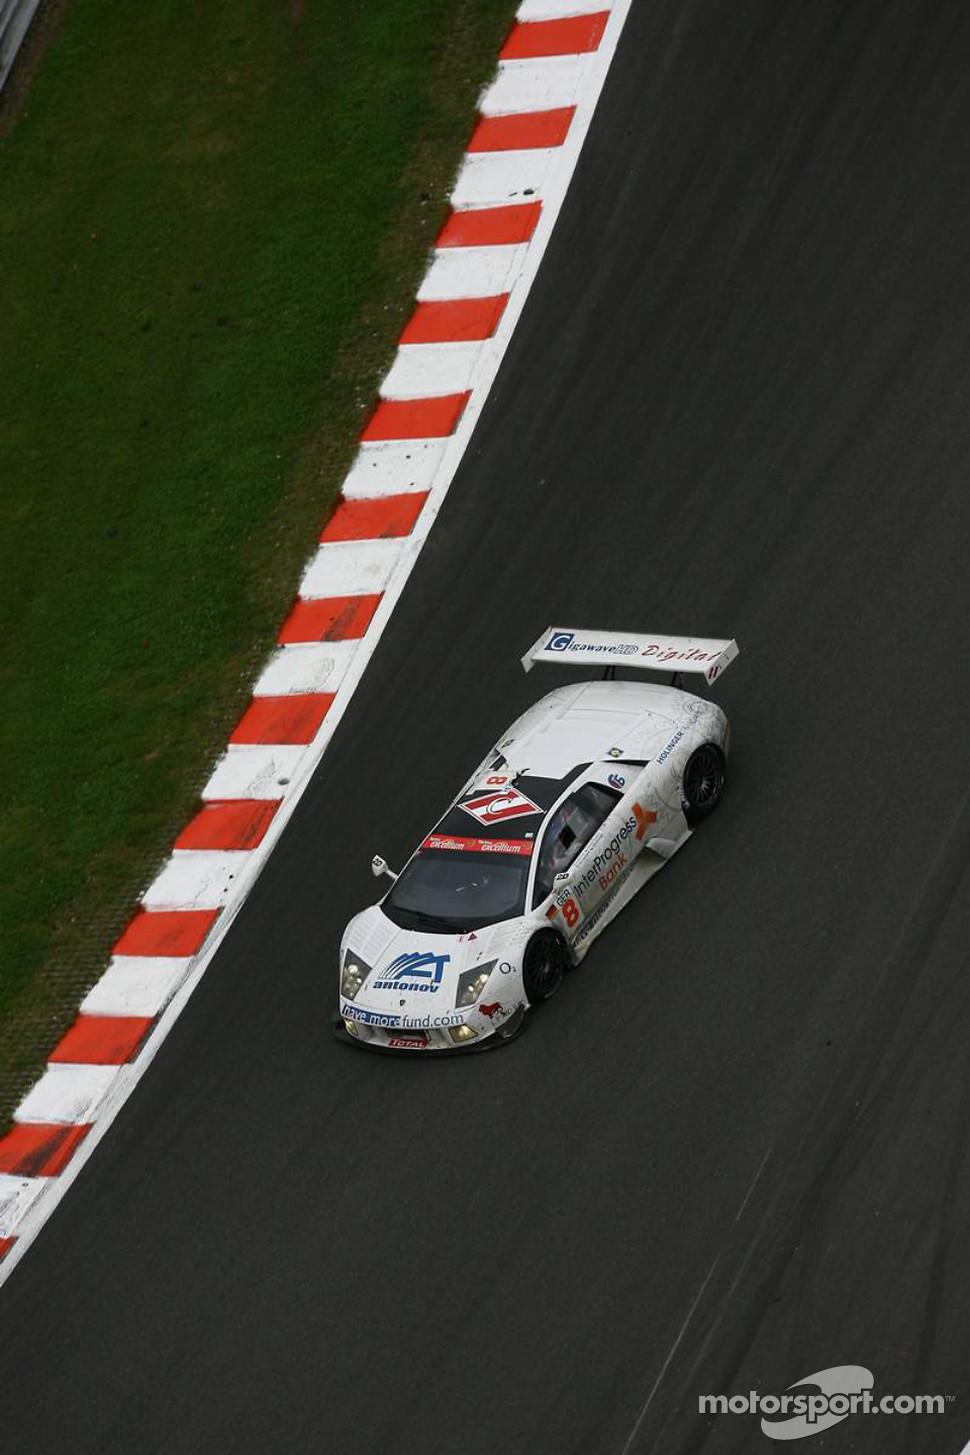 FIA GT, 24 Hours of Spa